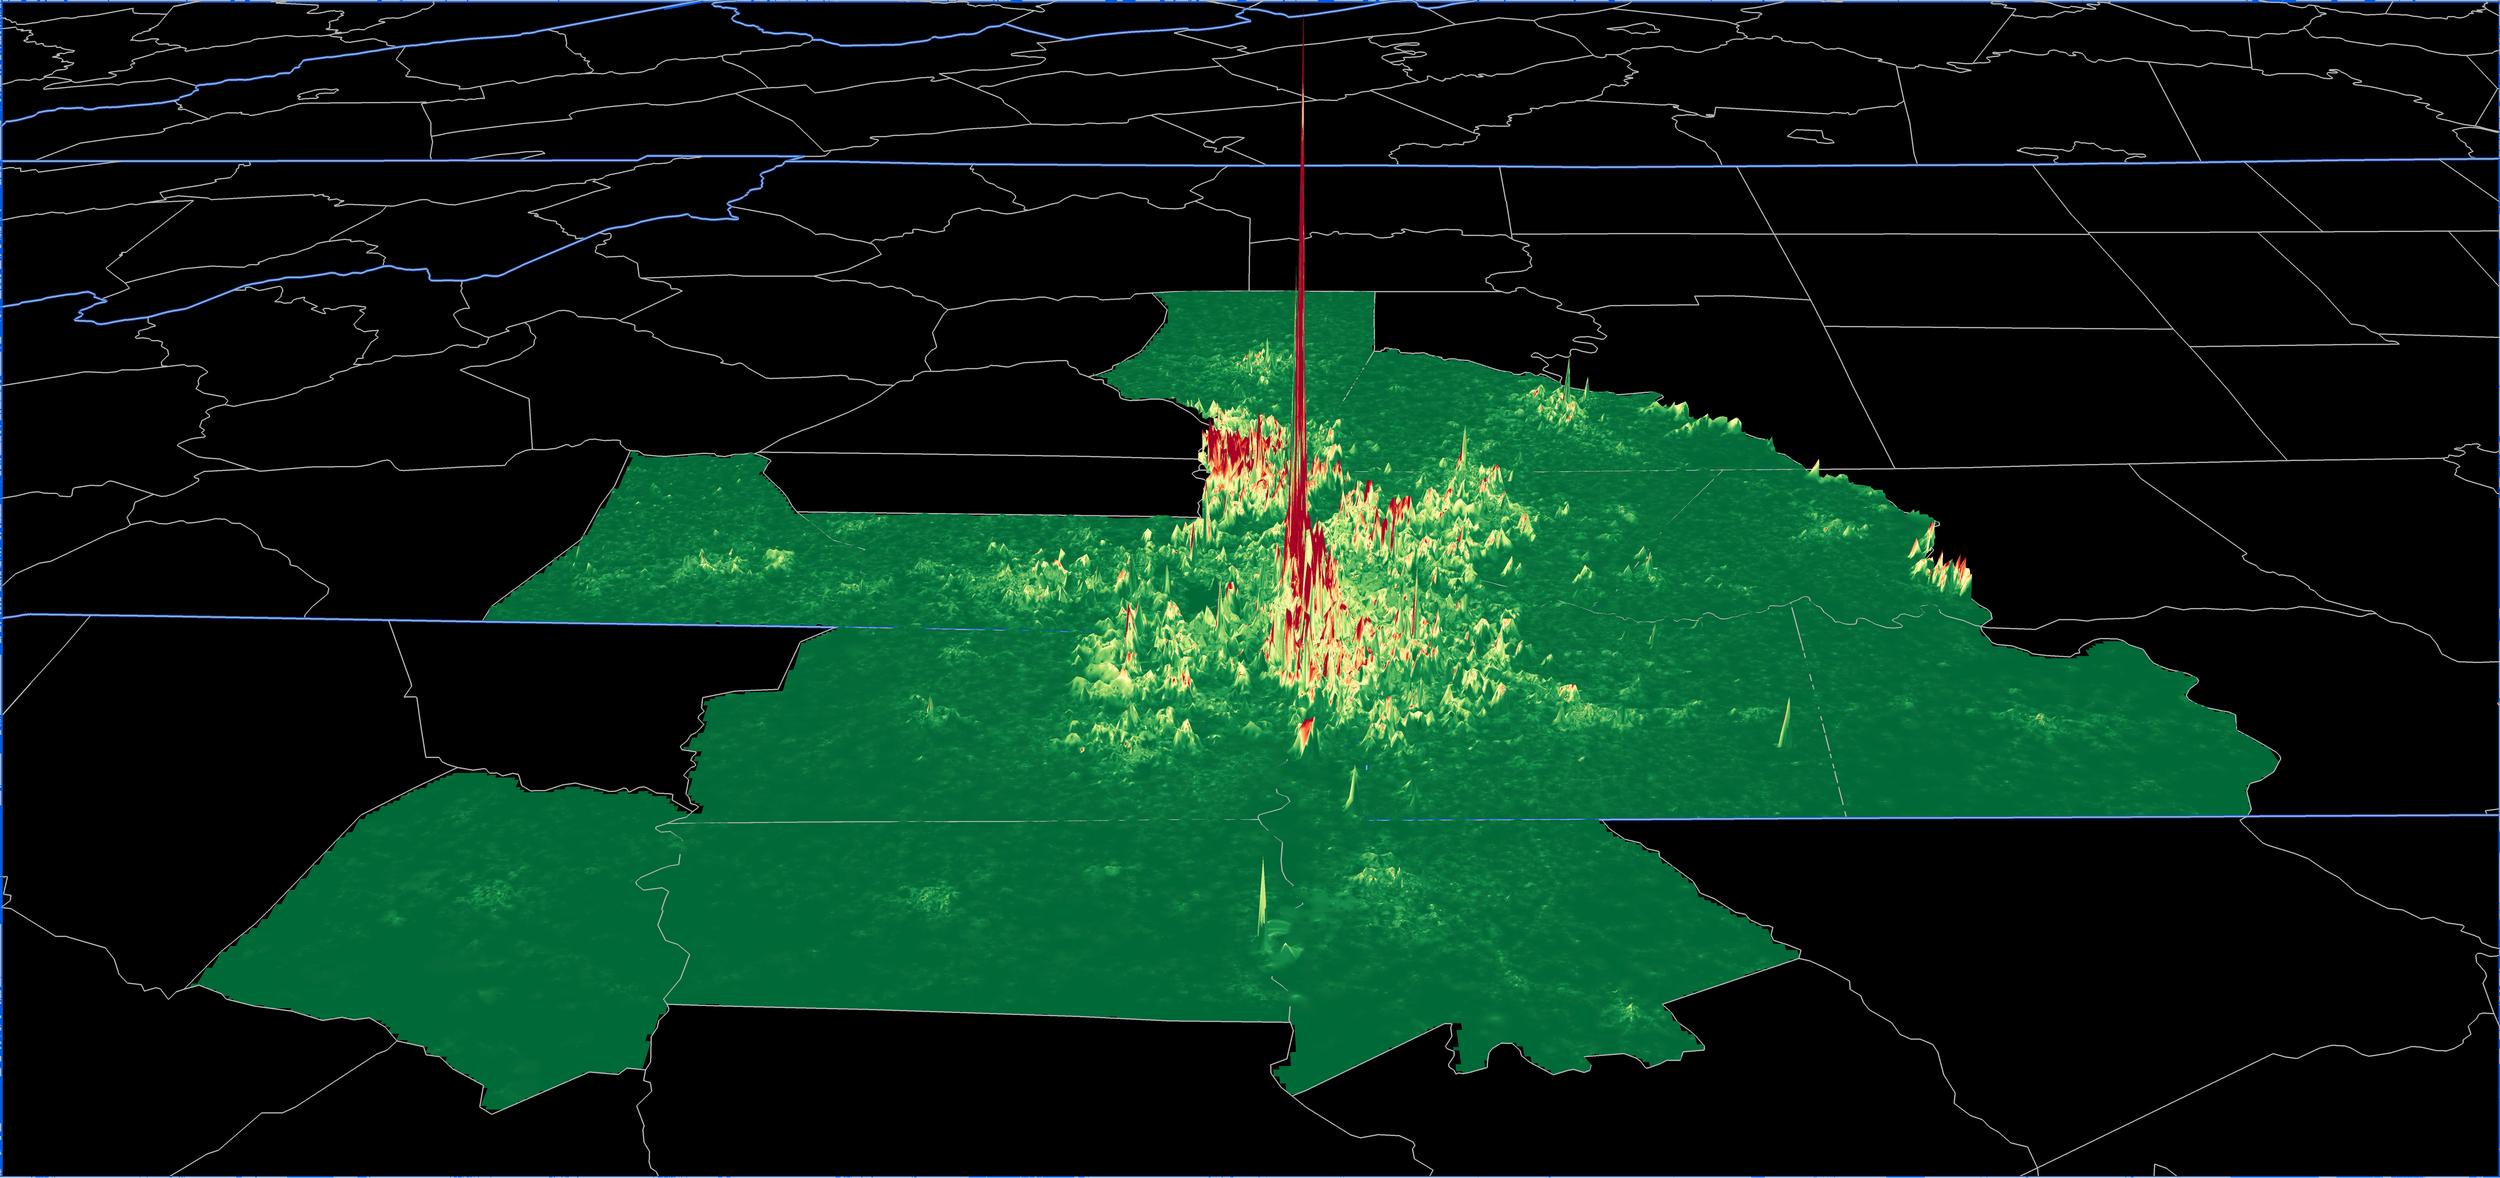 Property Value per Acre across the Charlotte, NC Metro Region.